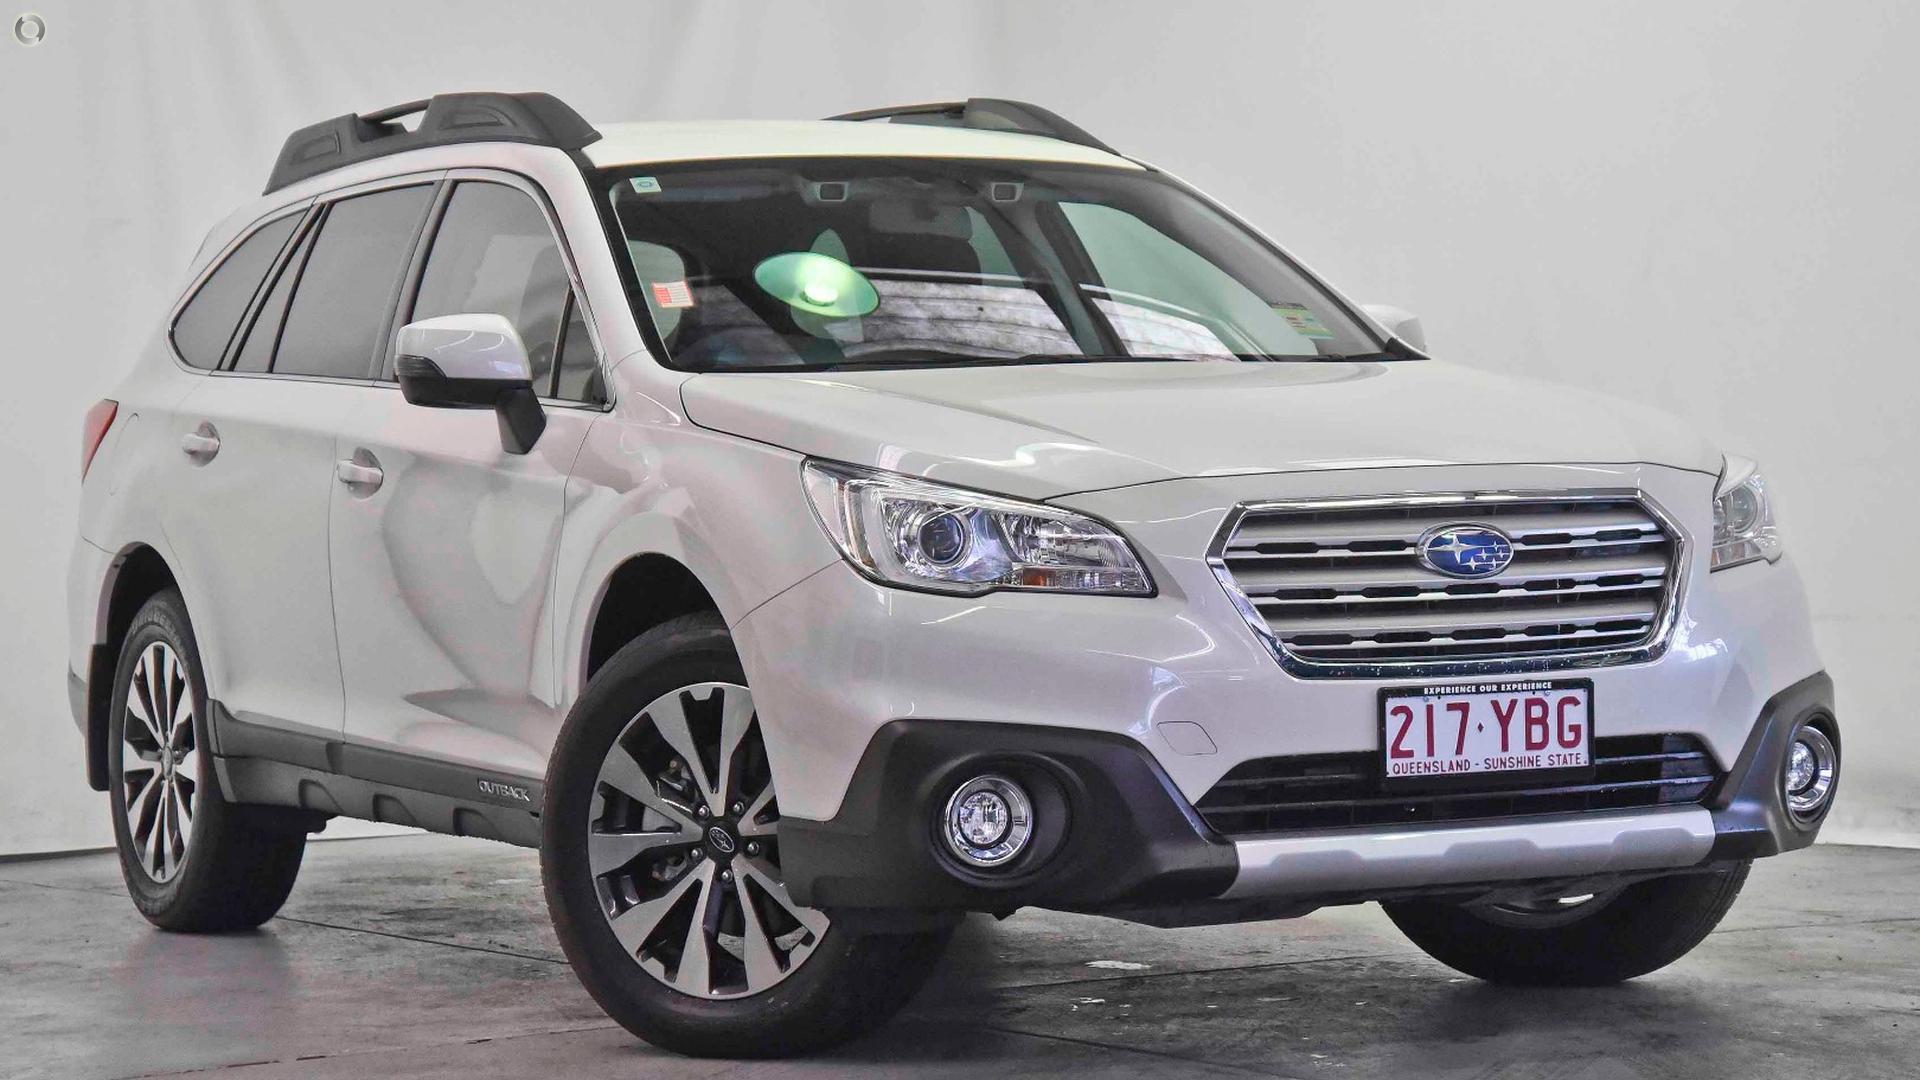 2017 Subaru Outback 2.5i Fleet Edition